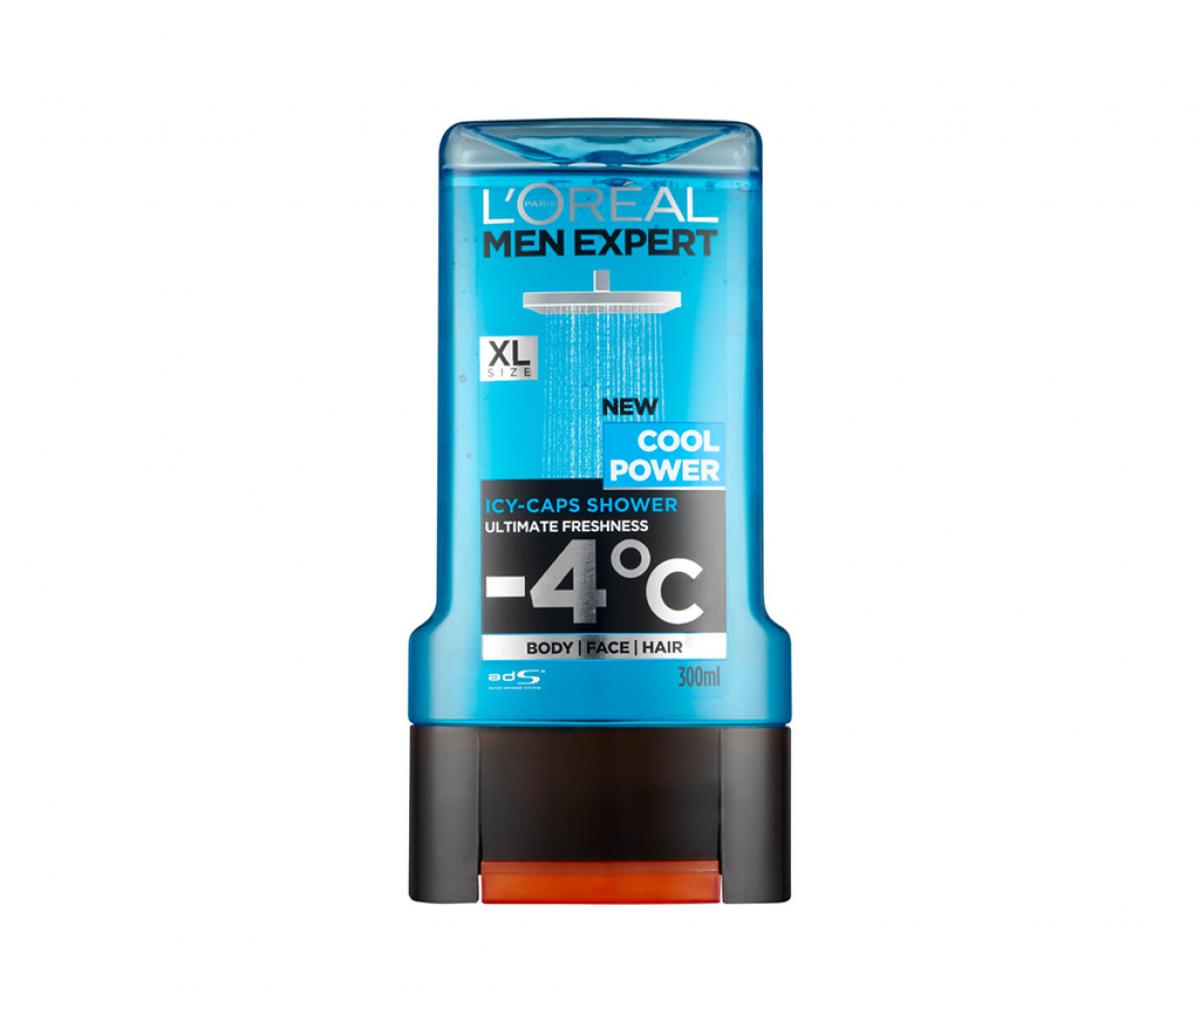 L'Oreal  Men Expert Cool Power Shower Gel